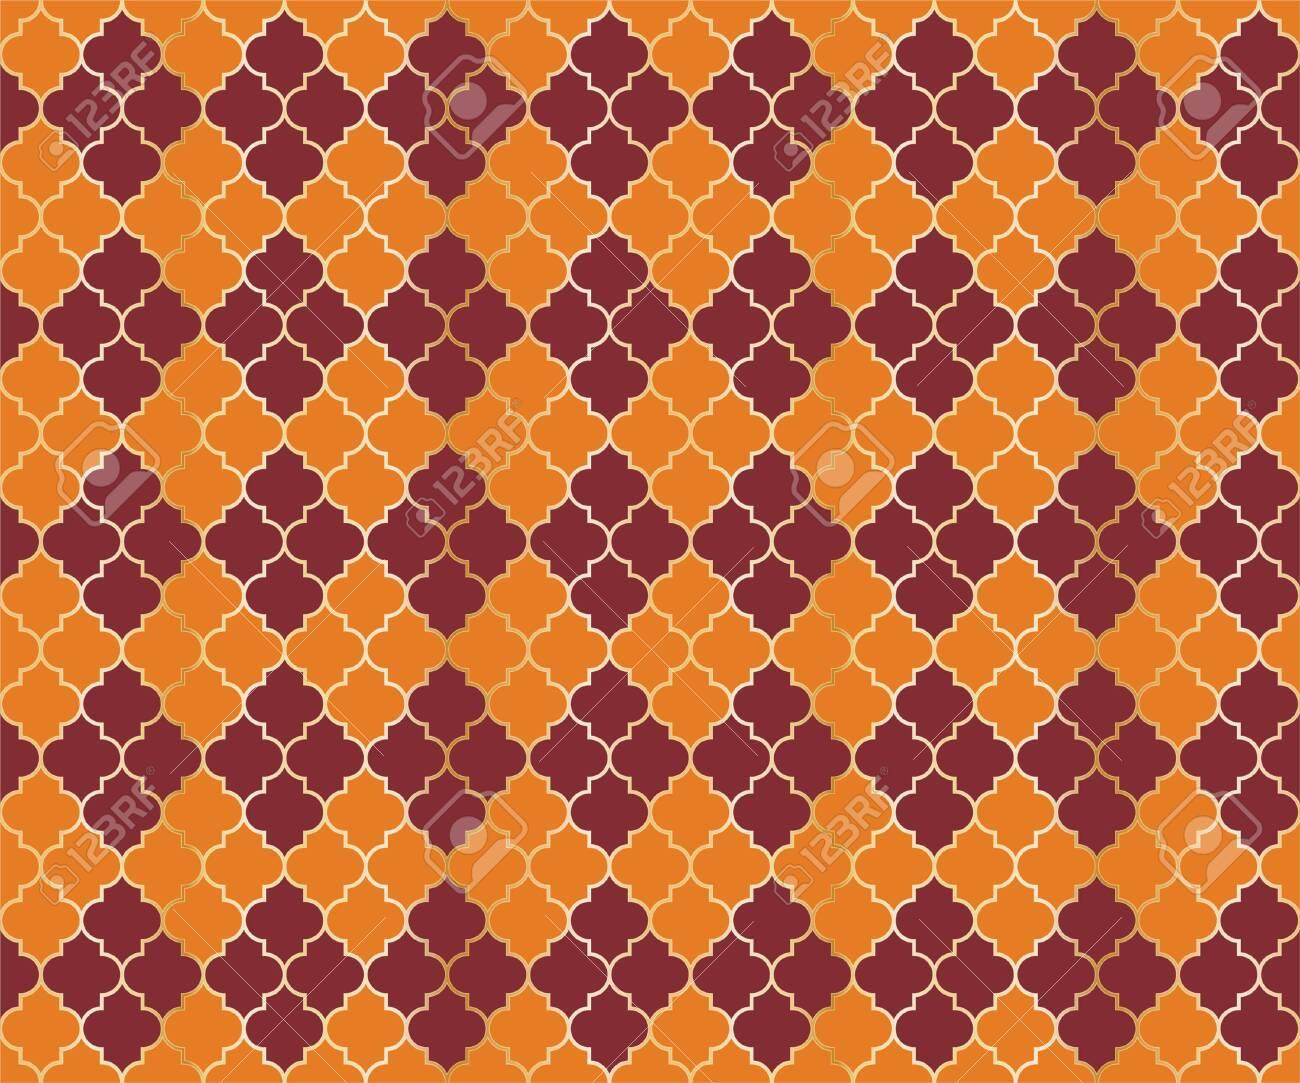 Eastern Mosque Vector Seamless Pattern  Argyle rhombus muslim